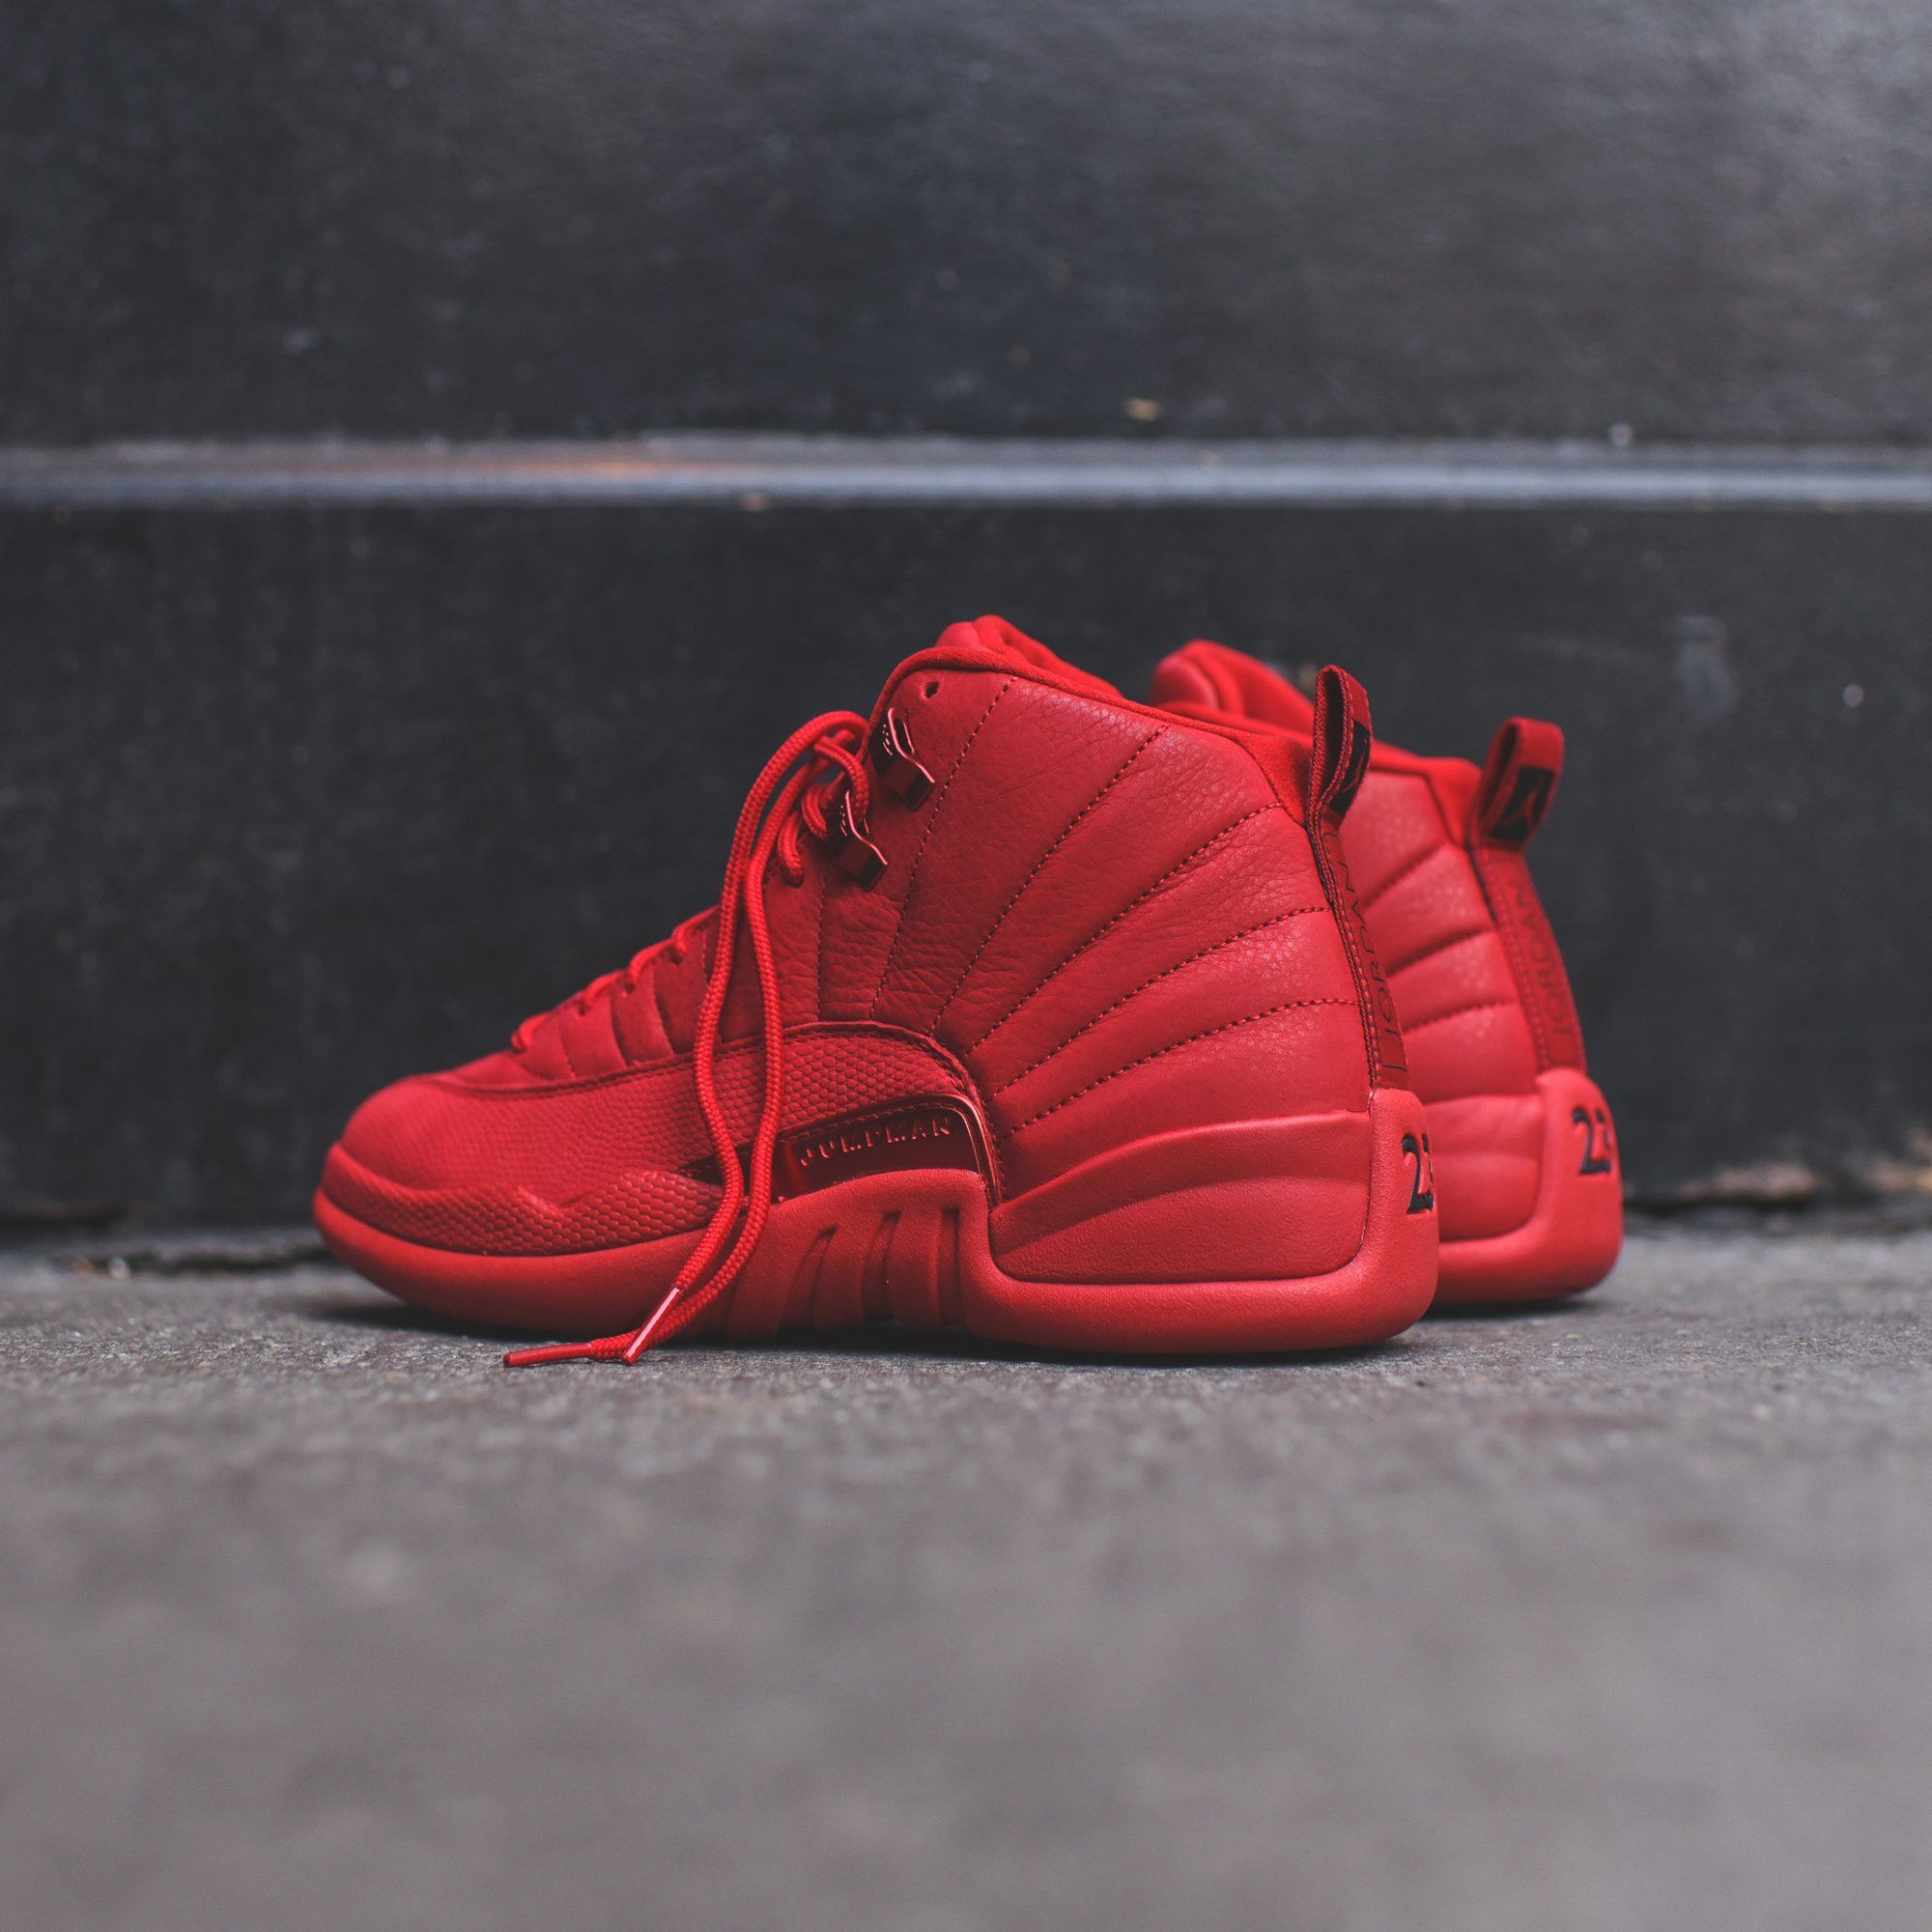 Nike Air Jordan 12 Retro - Gym Red